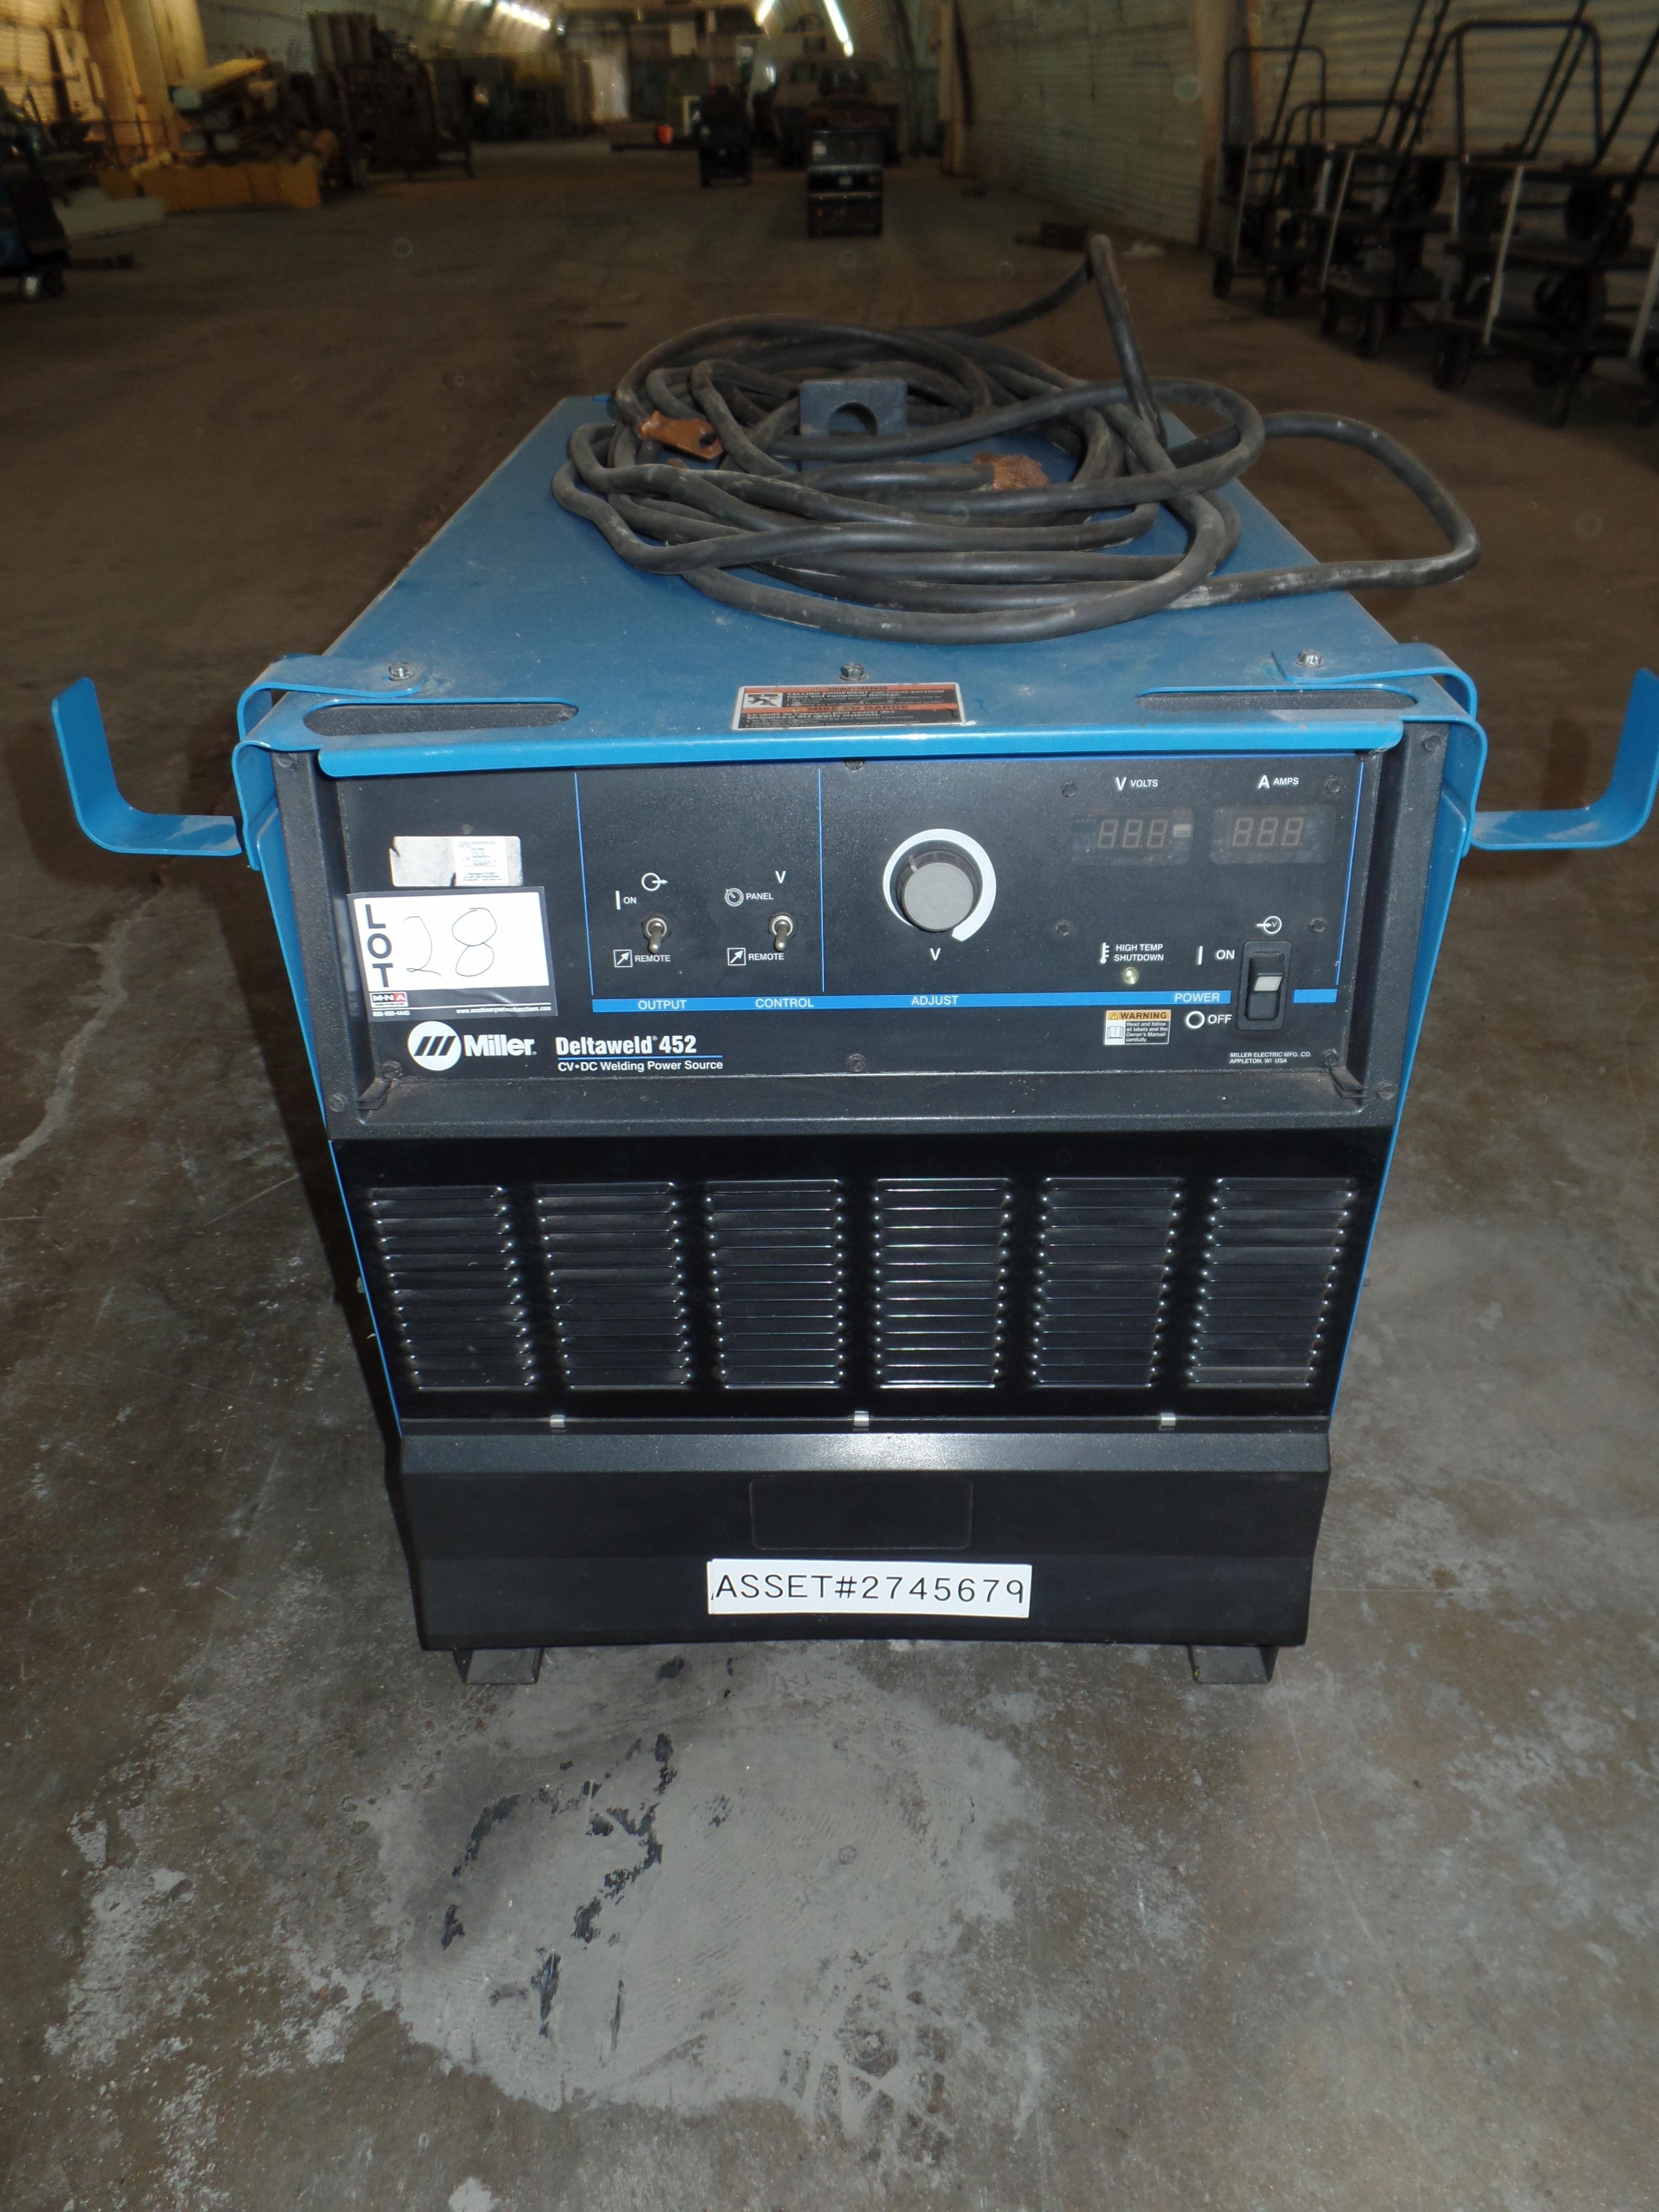 Deltaweld 452 MIG Welder S/N MC470025C (Located in Fort Worth, TX)